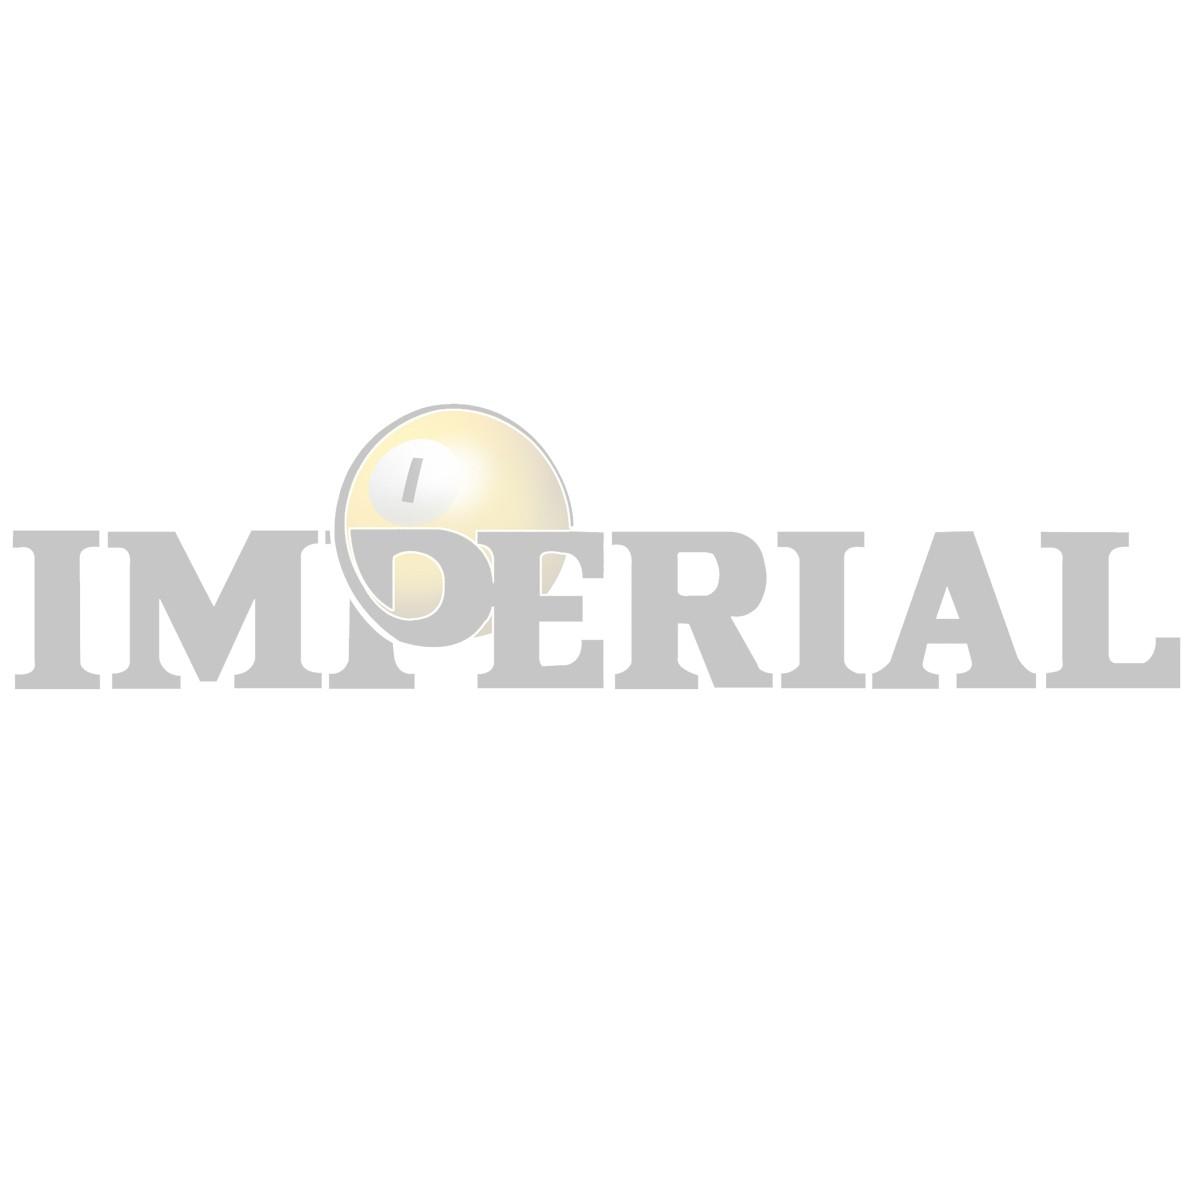 Los Angeles Angels 9-foot Billiard Cloth